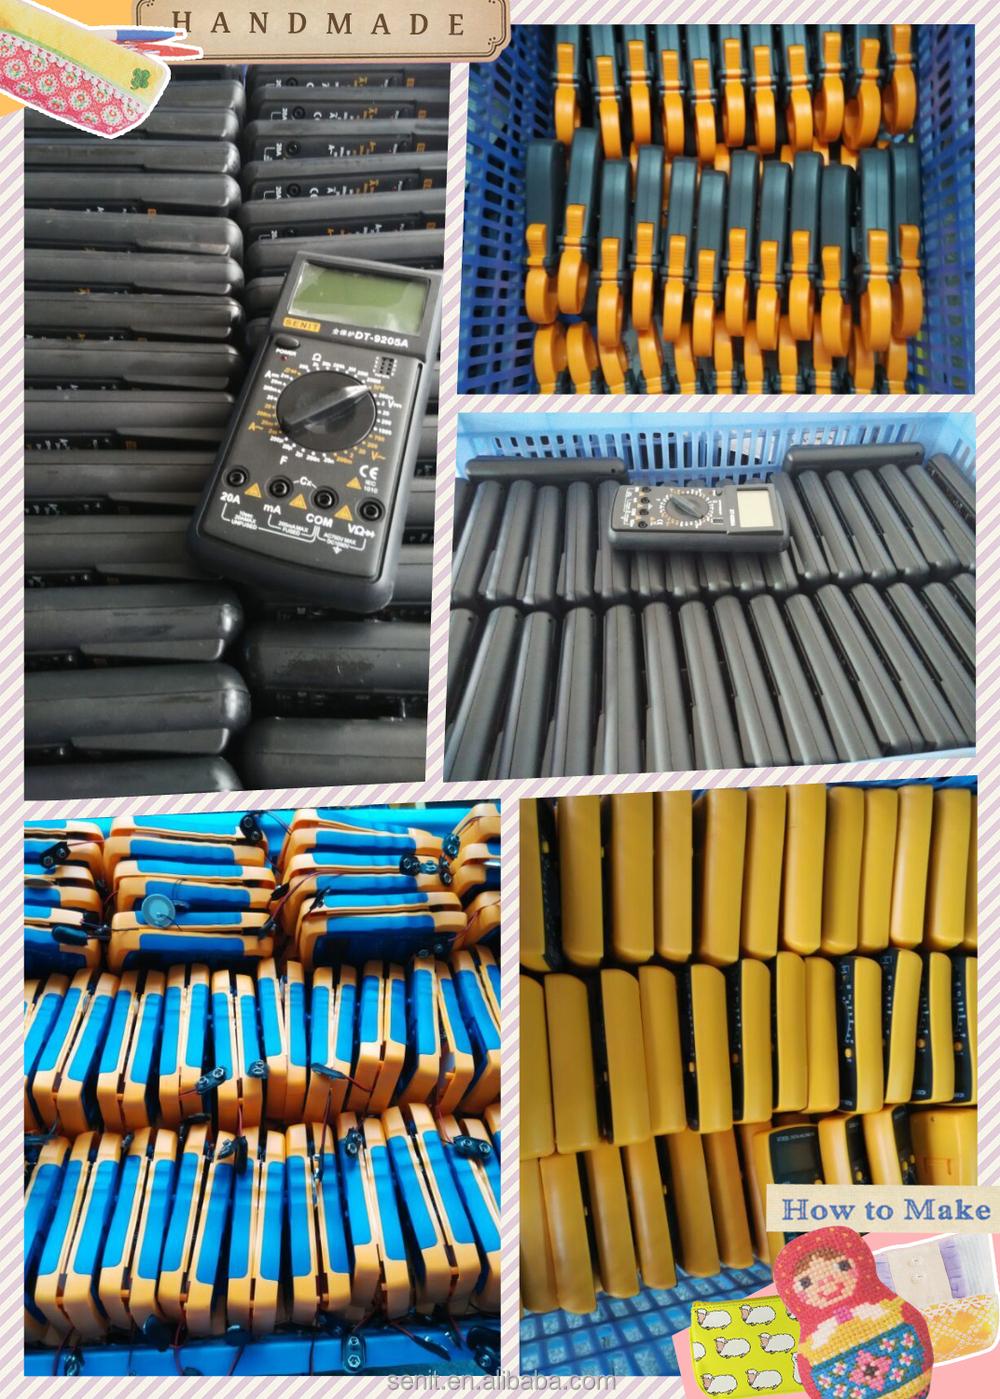 Multi Purpose Test Lead Smd Resistor Voltmeter Capacitor Tester Clip Lcr Bridge Patch Clamp Measure Universal Multipurpose Factory Goods